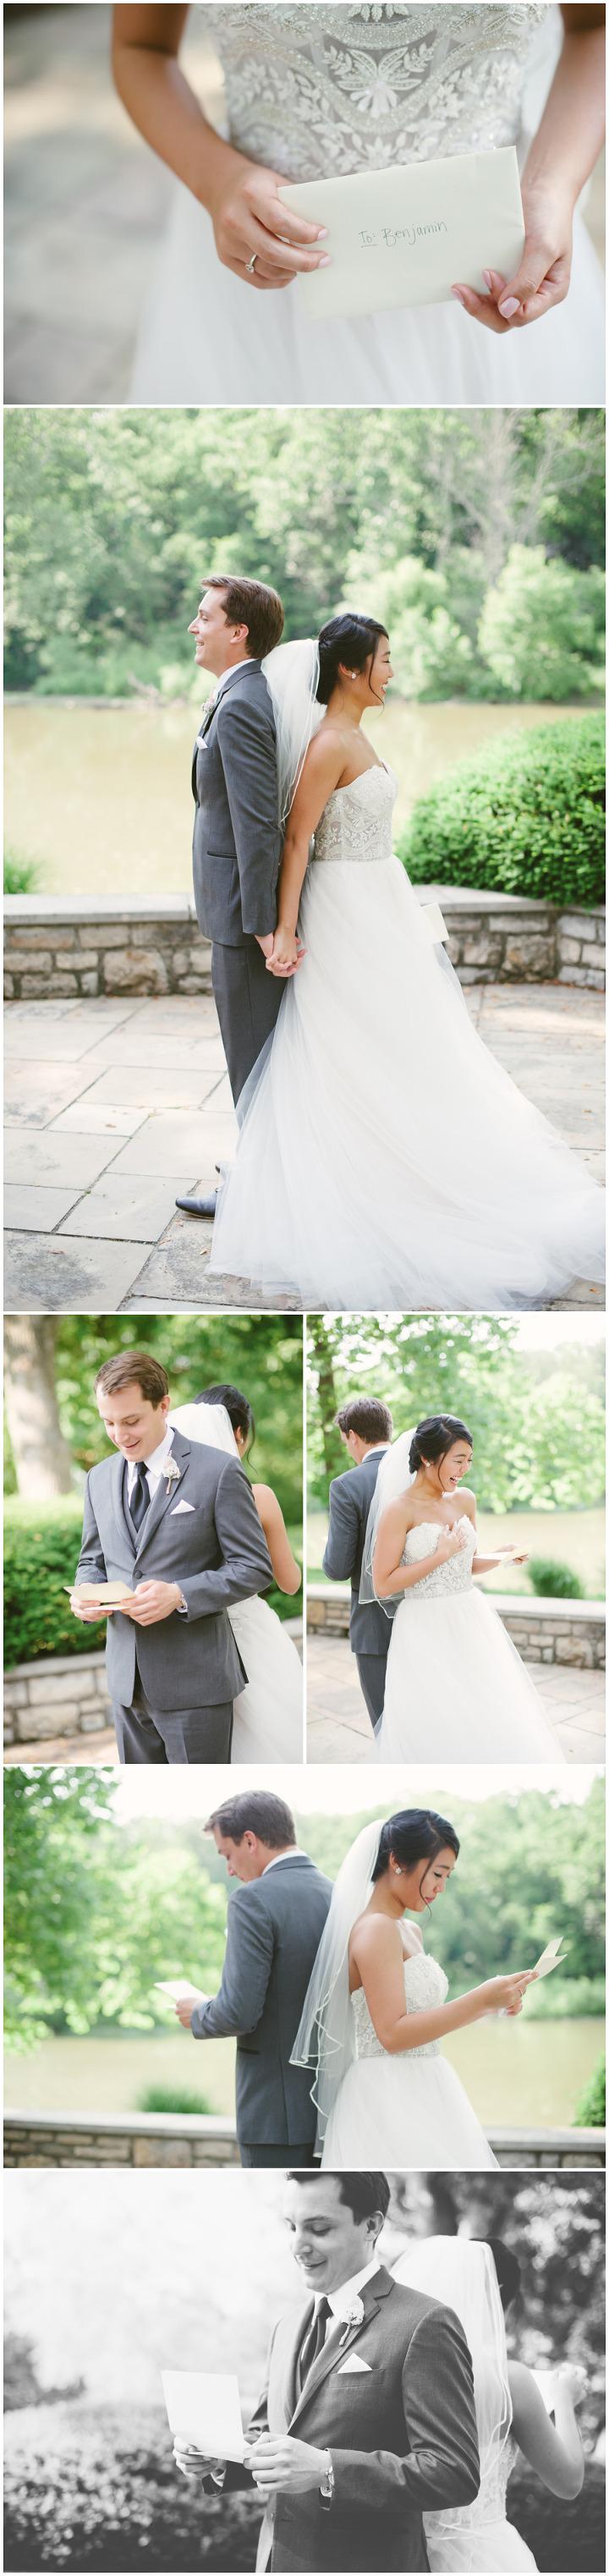 Blog Collage-Ruthie11